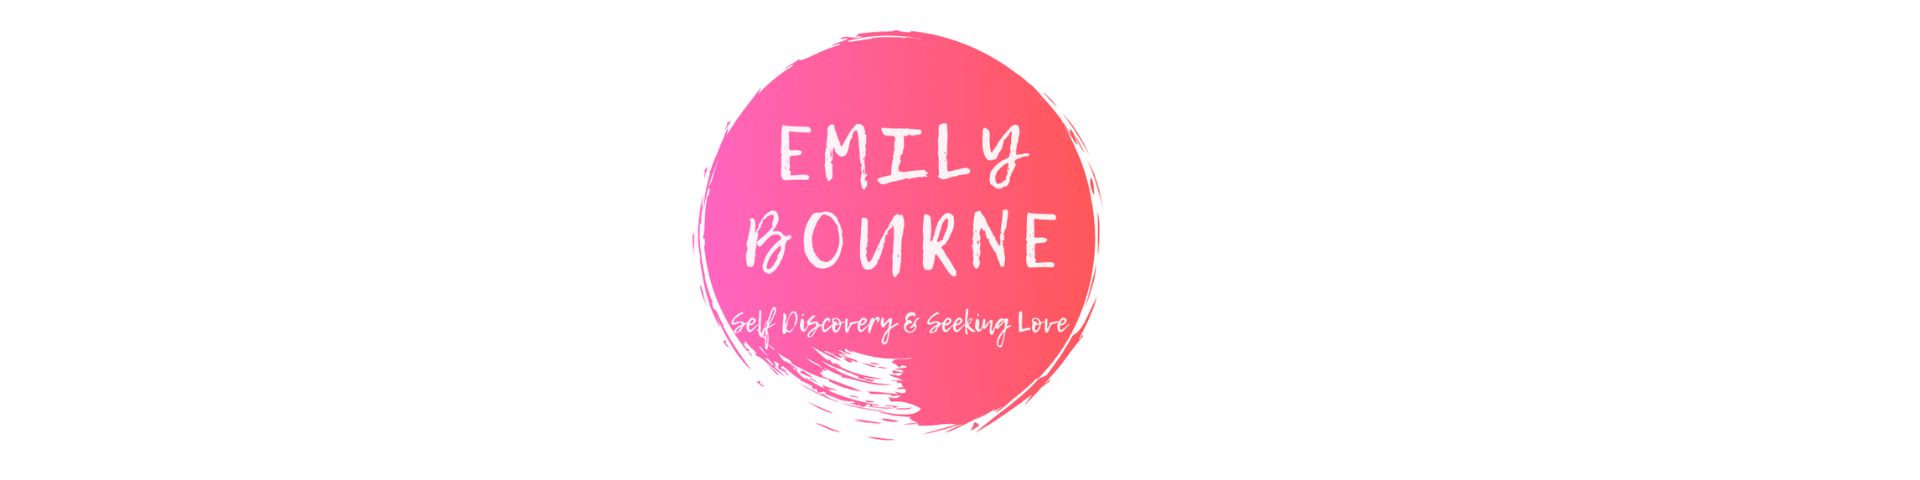 Emily Bourne